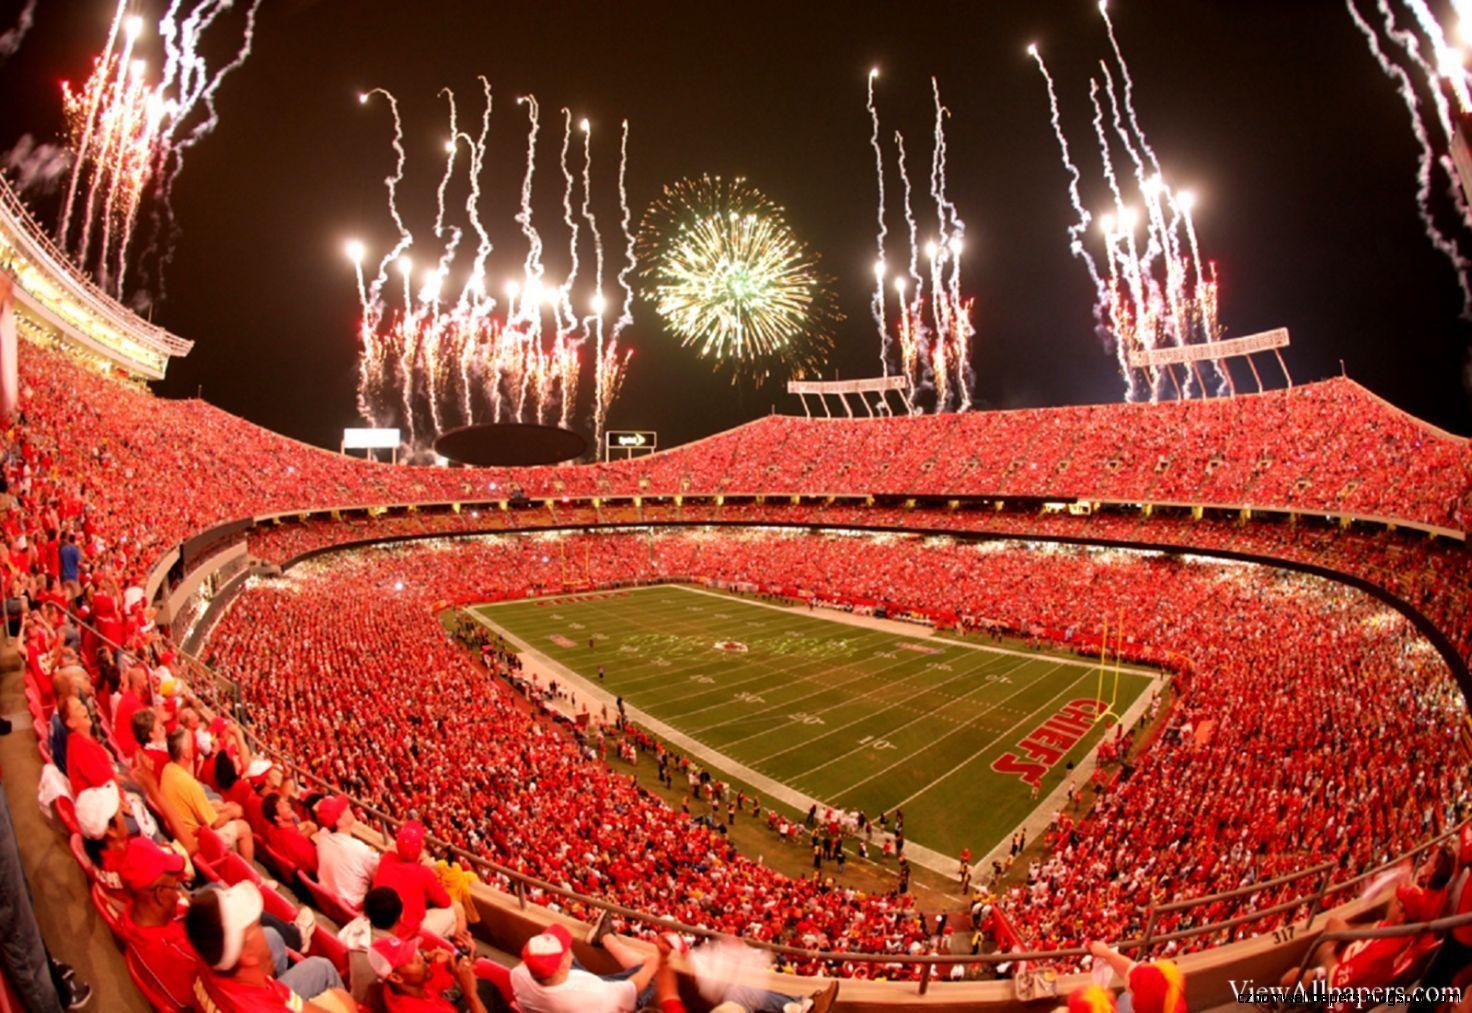 Kansas City Chiefs 4K Wallpapers - Top Free Kansas City Chiefs 4K Backgrounds - WallpaperAccess